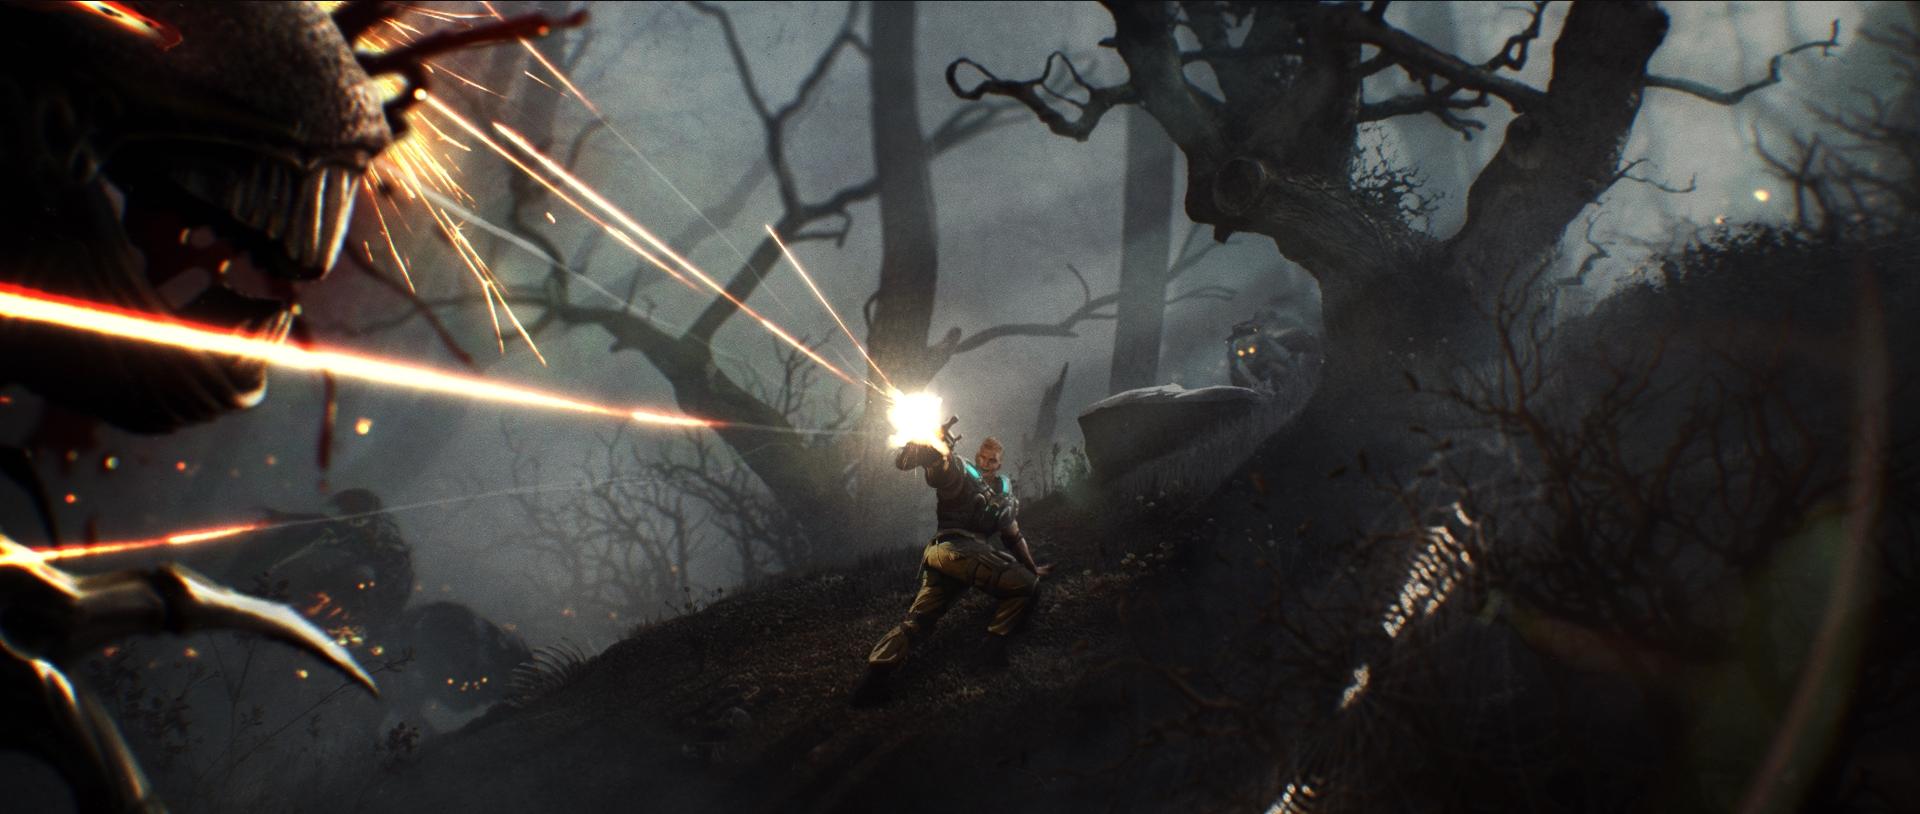 Gears of War - Launch Trailer Pitch   Key Art